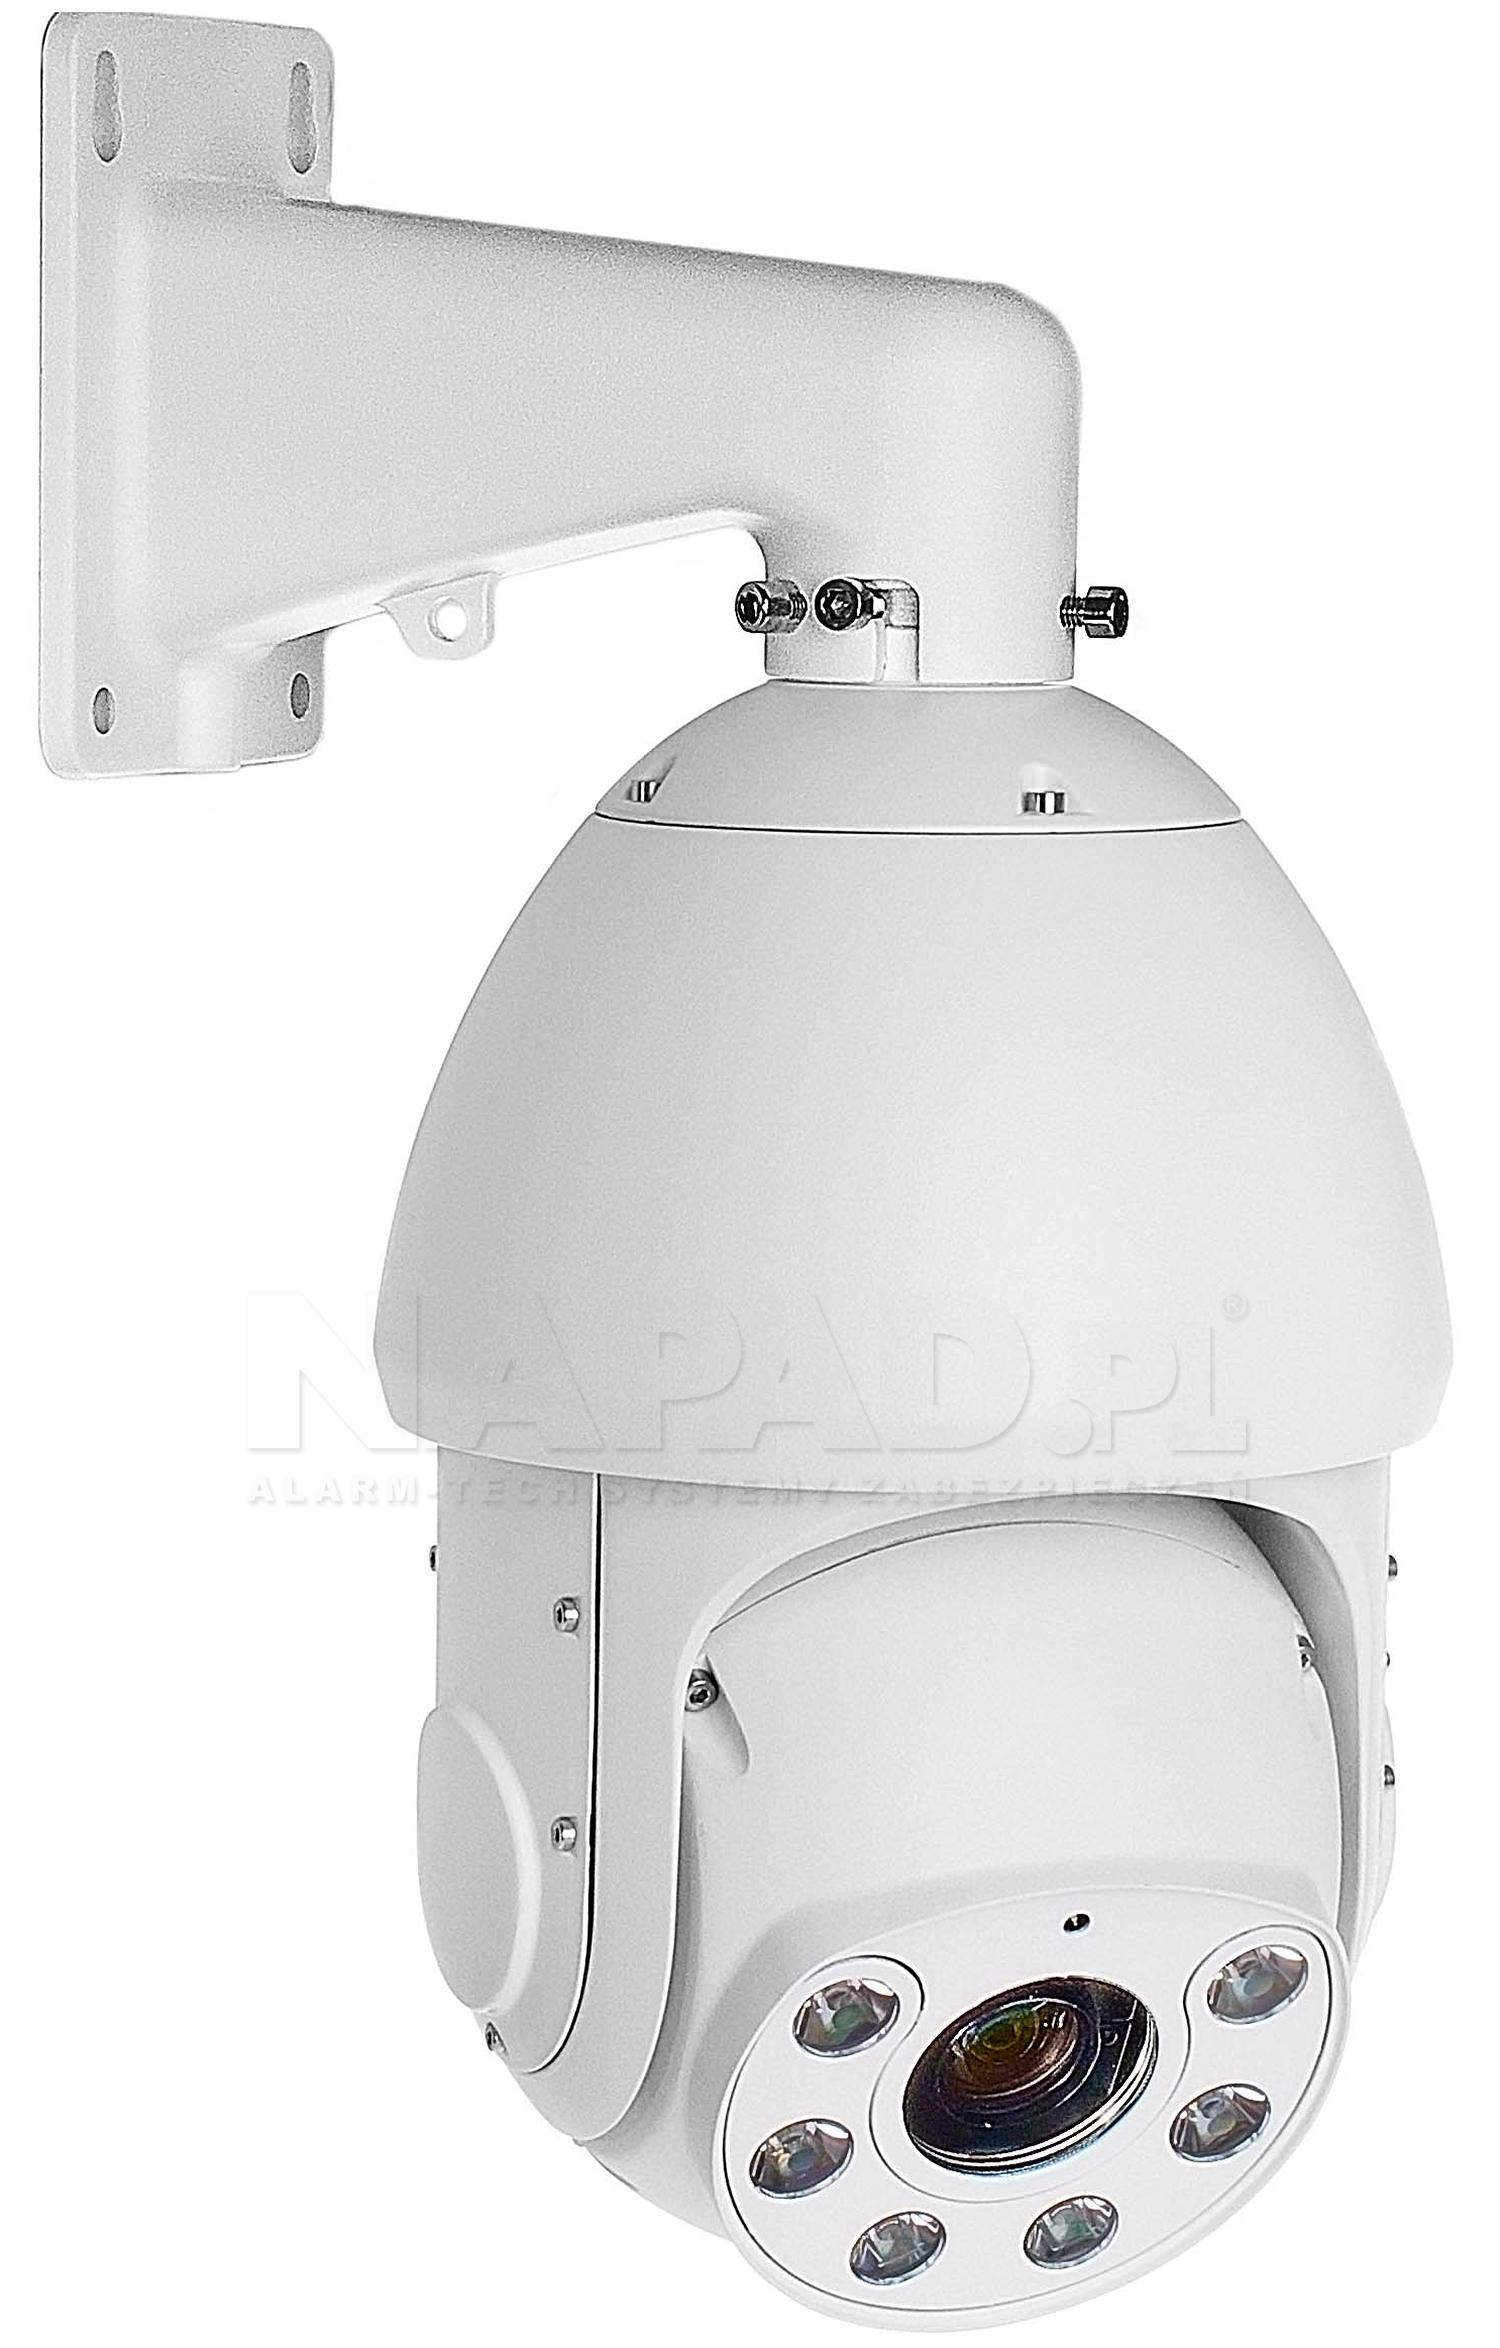 Kamera kolorowa szybkoobrotowa BCS SD5023